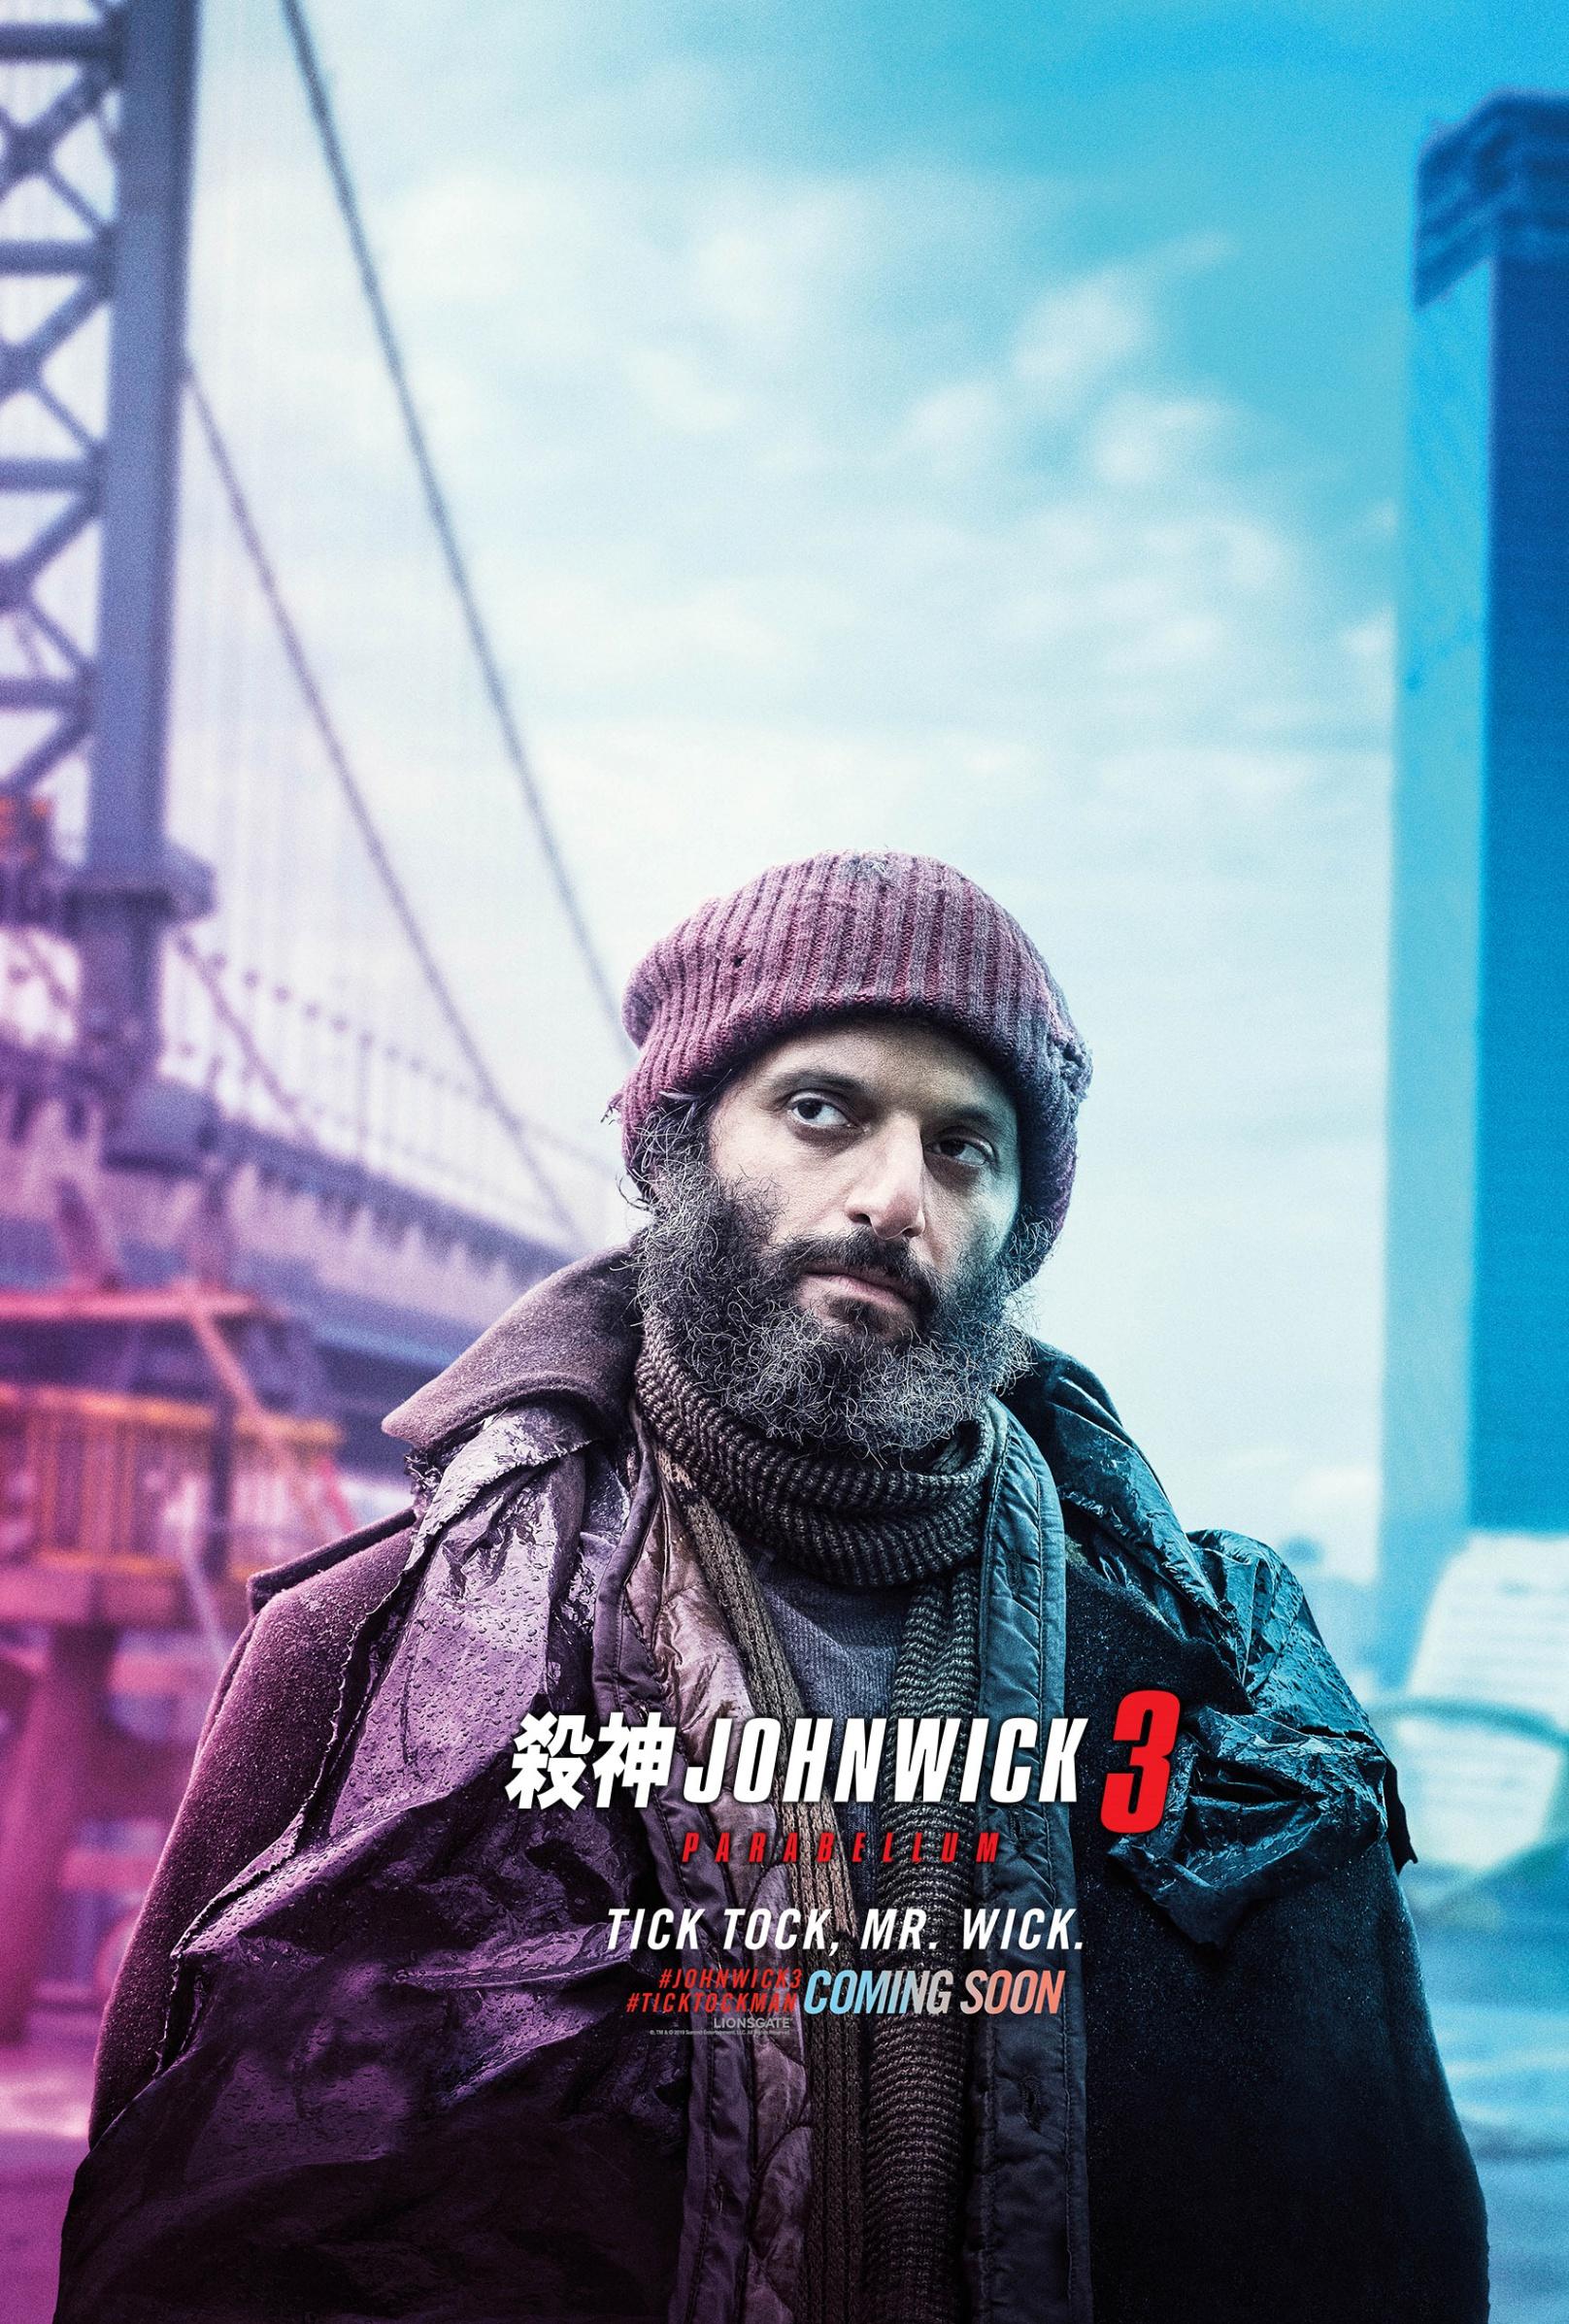 20190322_JohnWick3Parabellum_Poster8.jpg